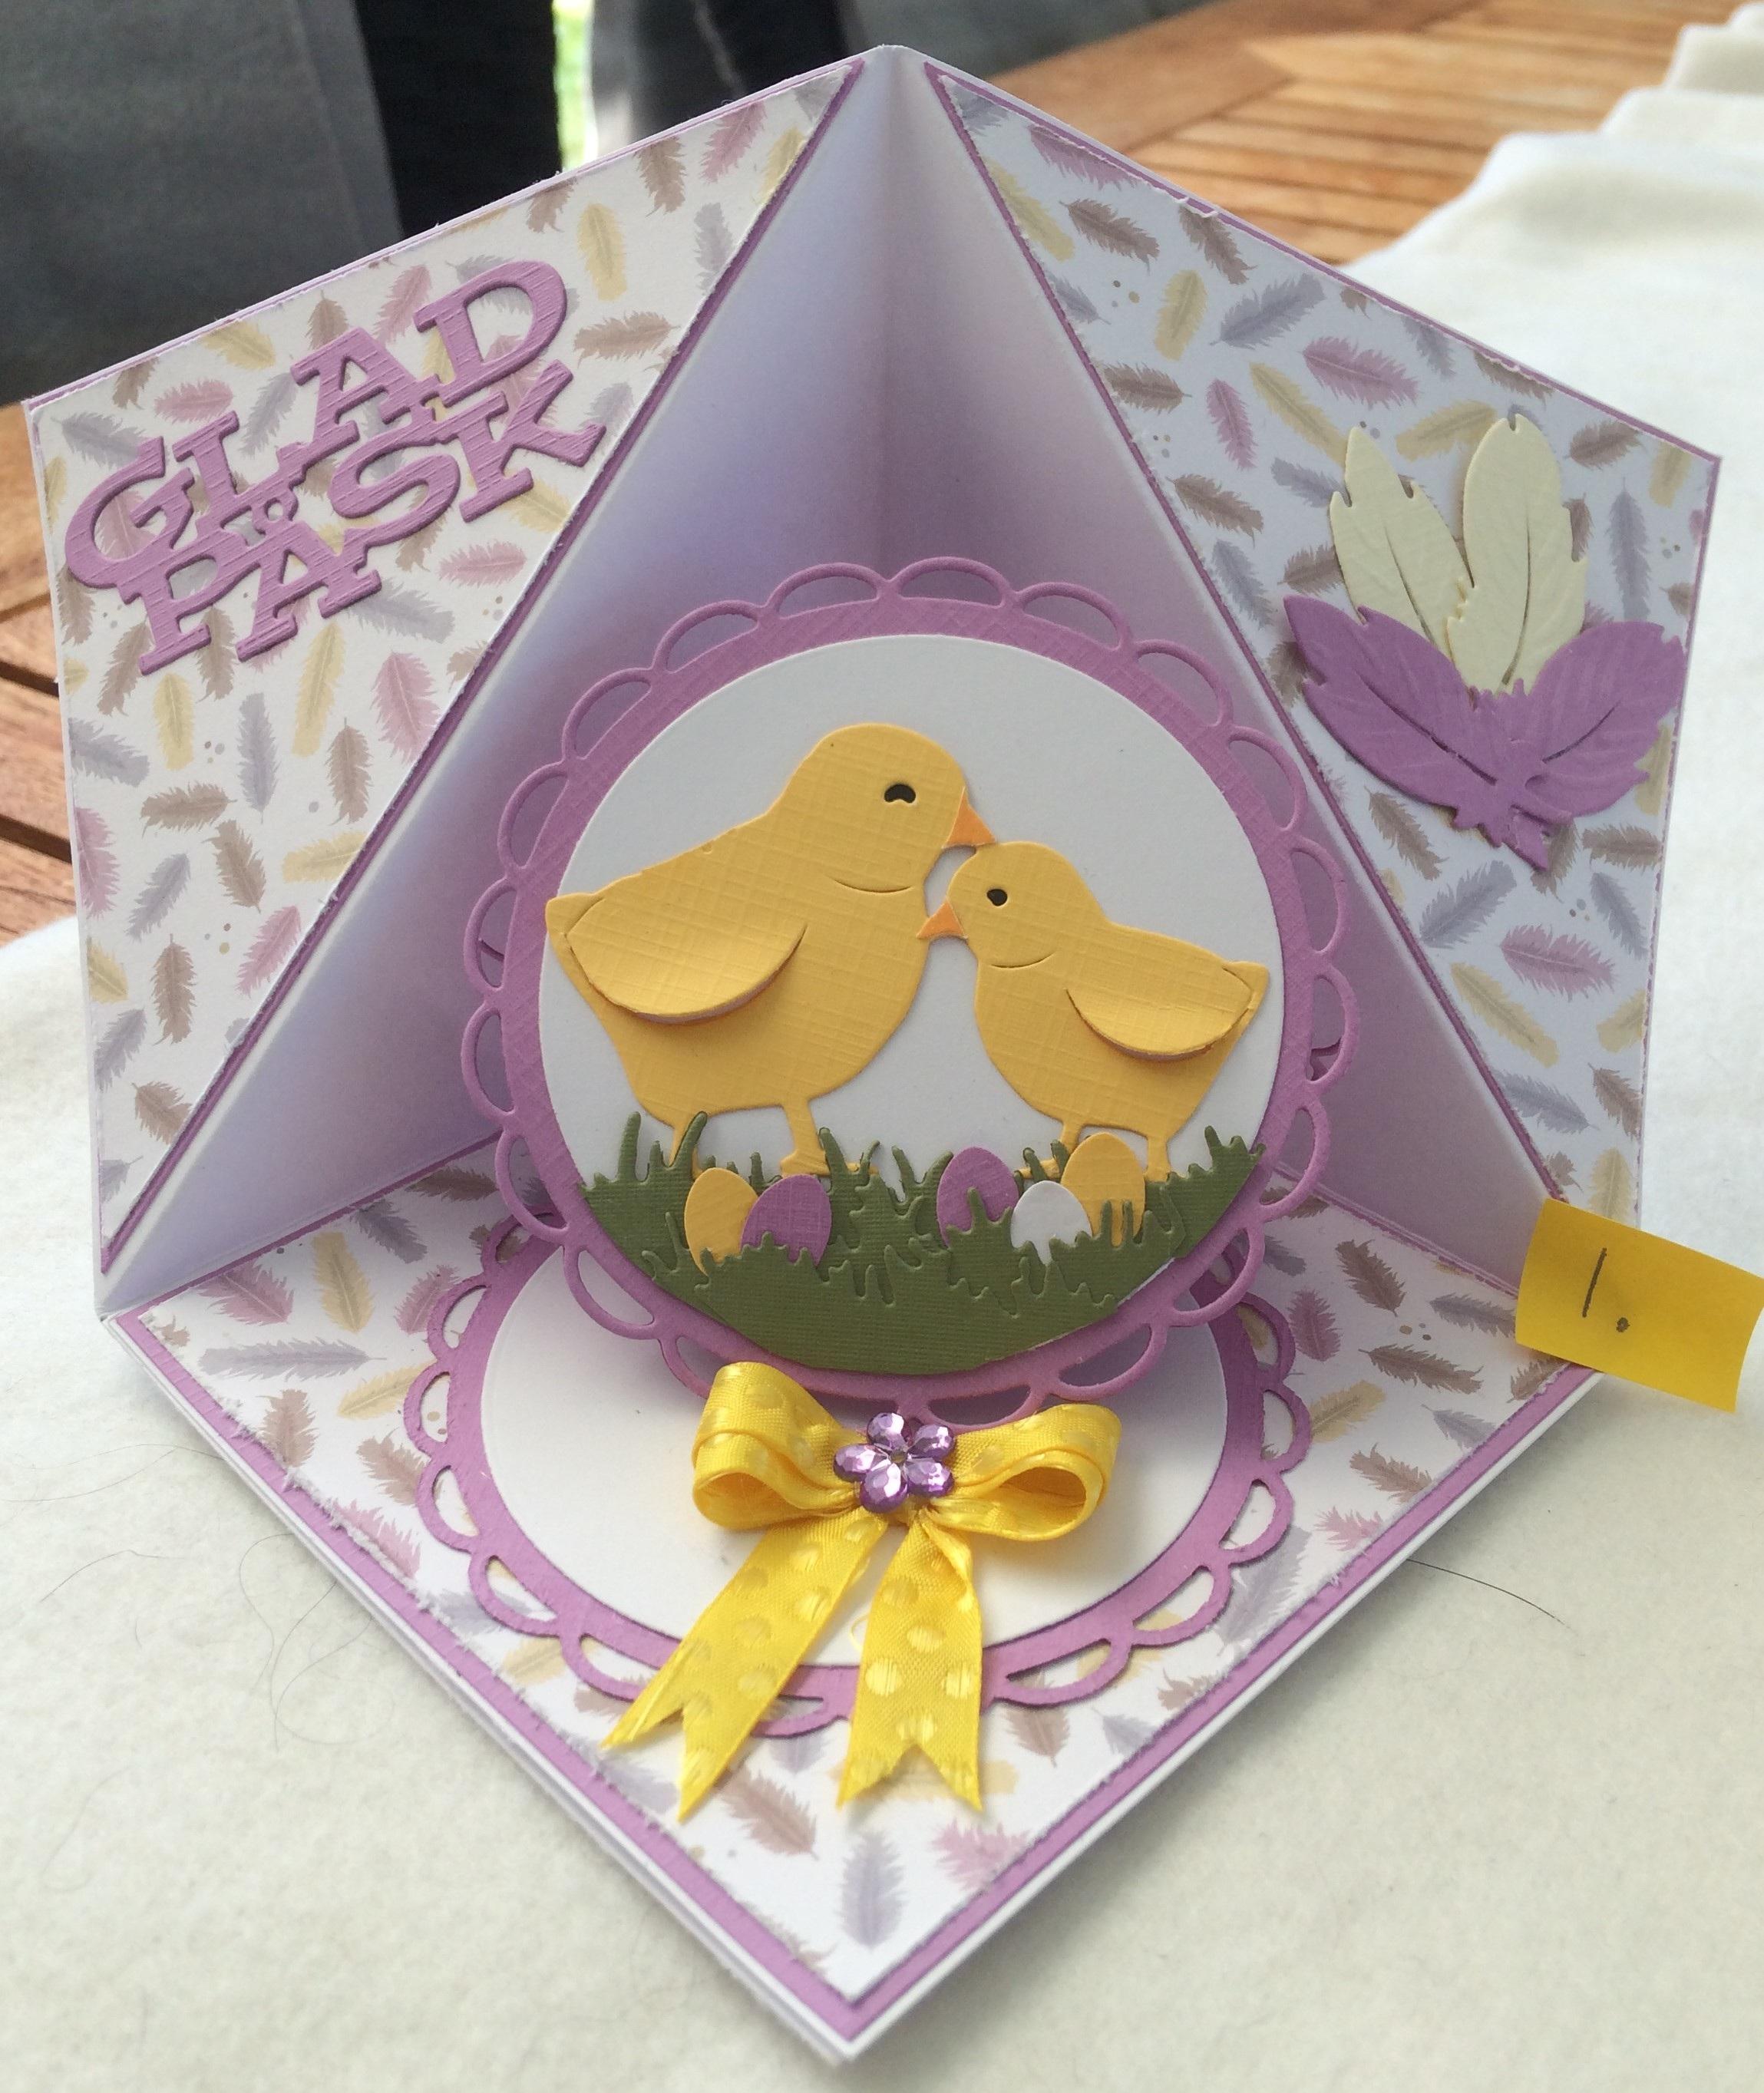 Gummiapan dies Glas Påsk, Nellie´s Multi frames MFD055 Gräs PM 10002, Kycklinga & Fjädrar JAD10067. Kort vikning Triangel, Corner pop up card